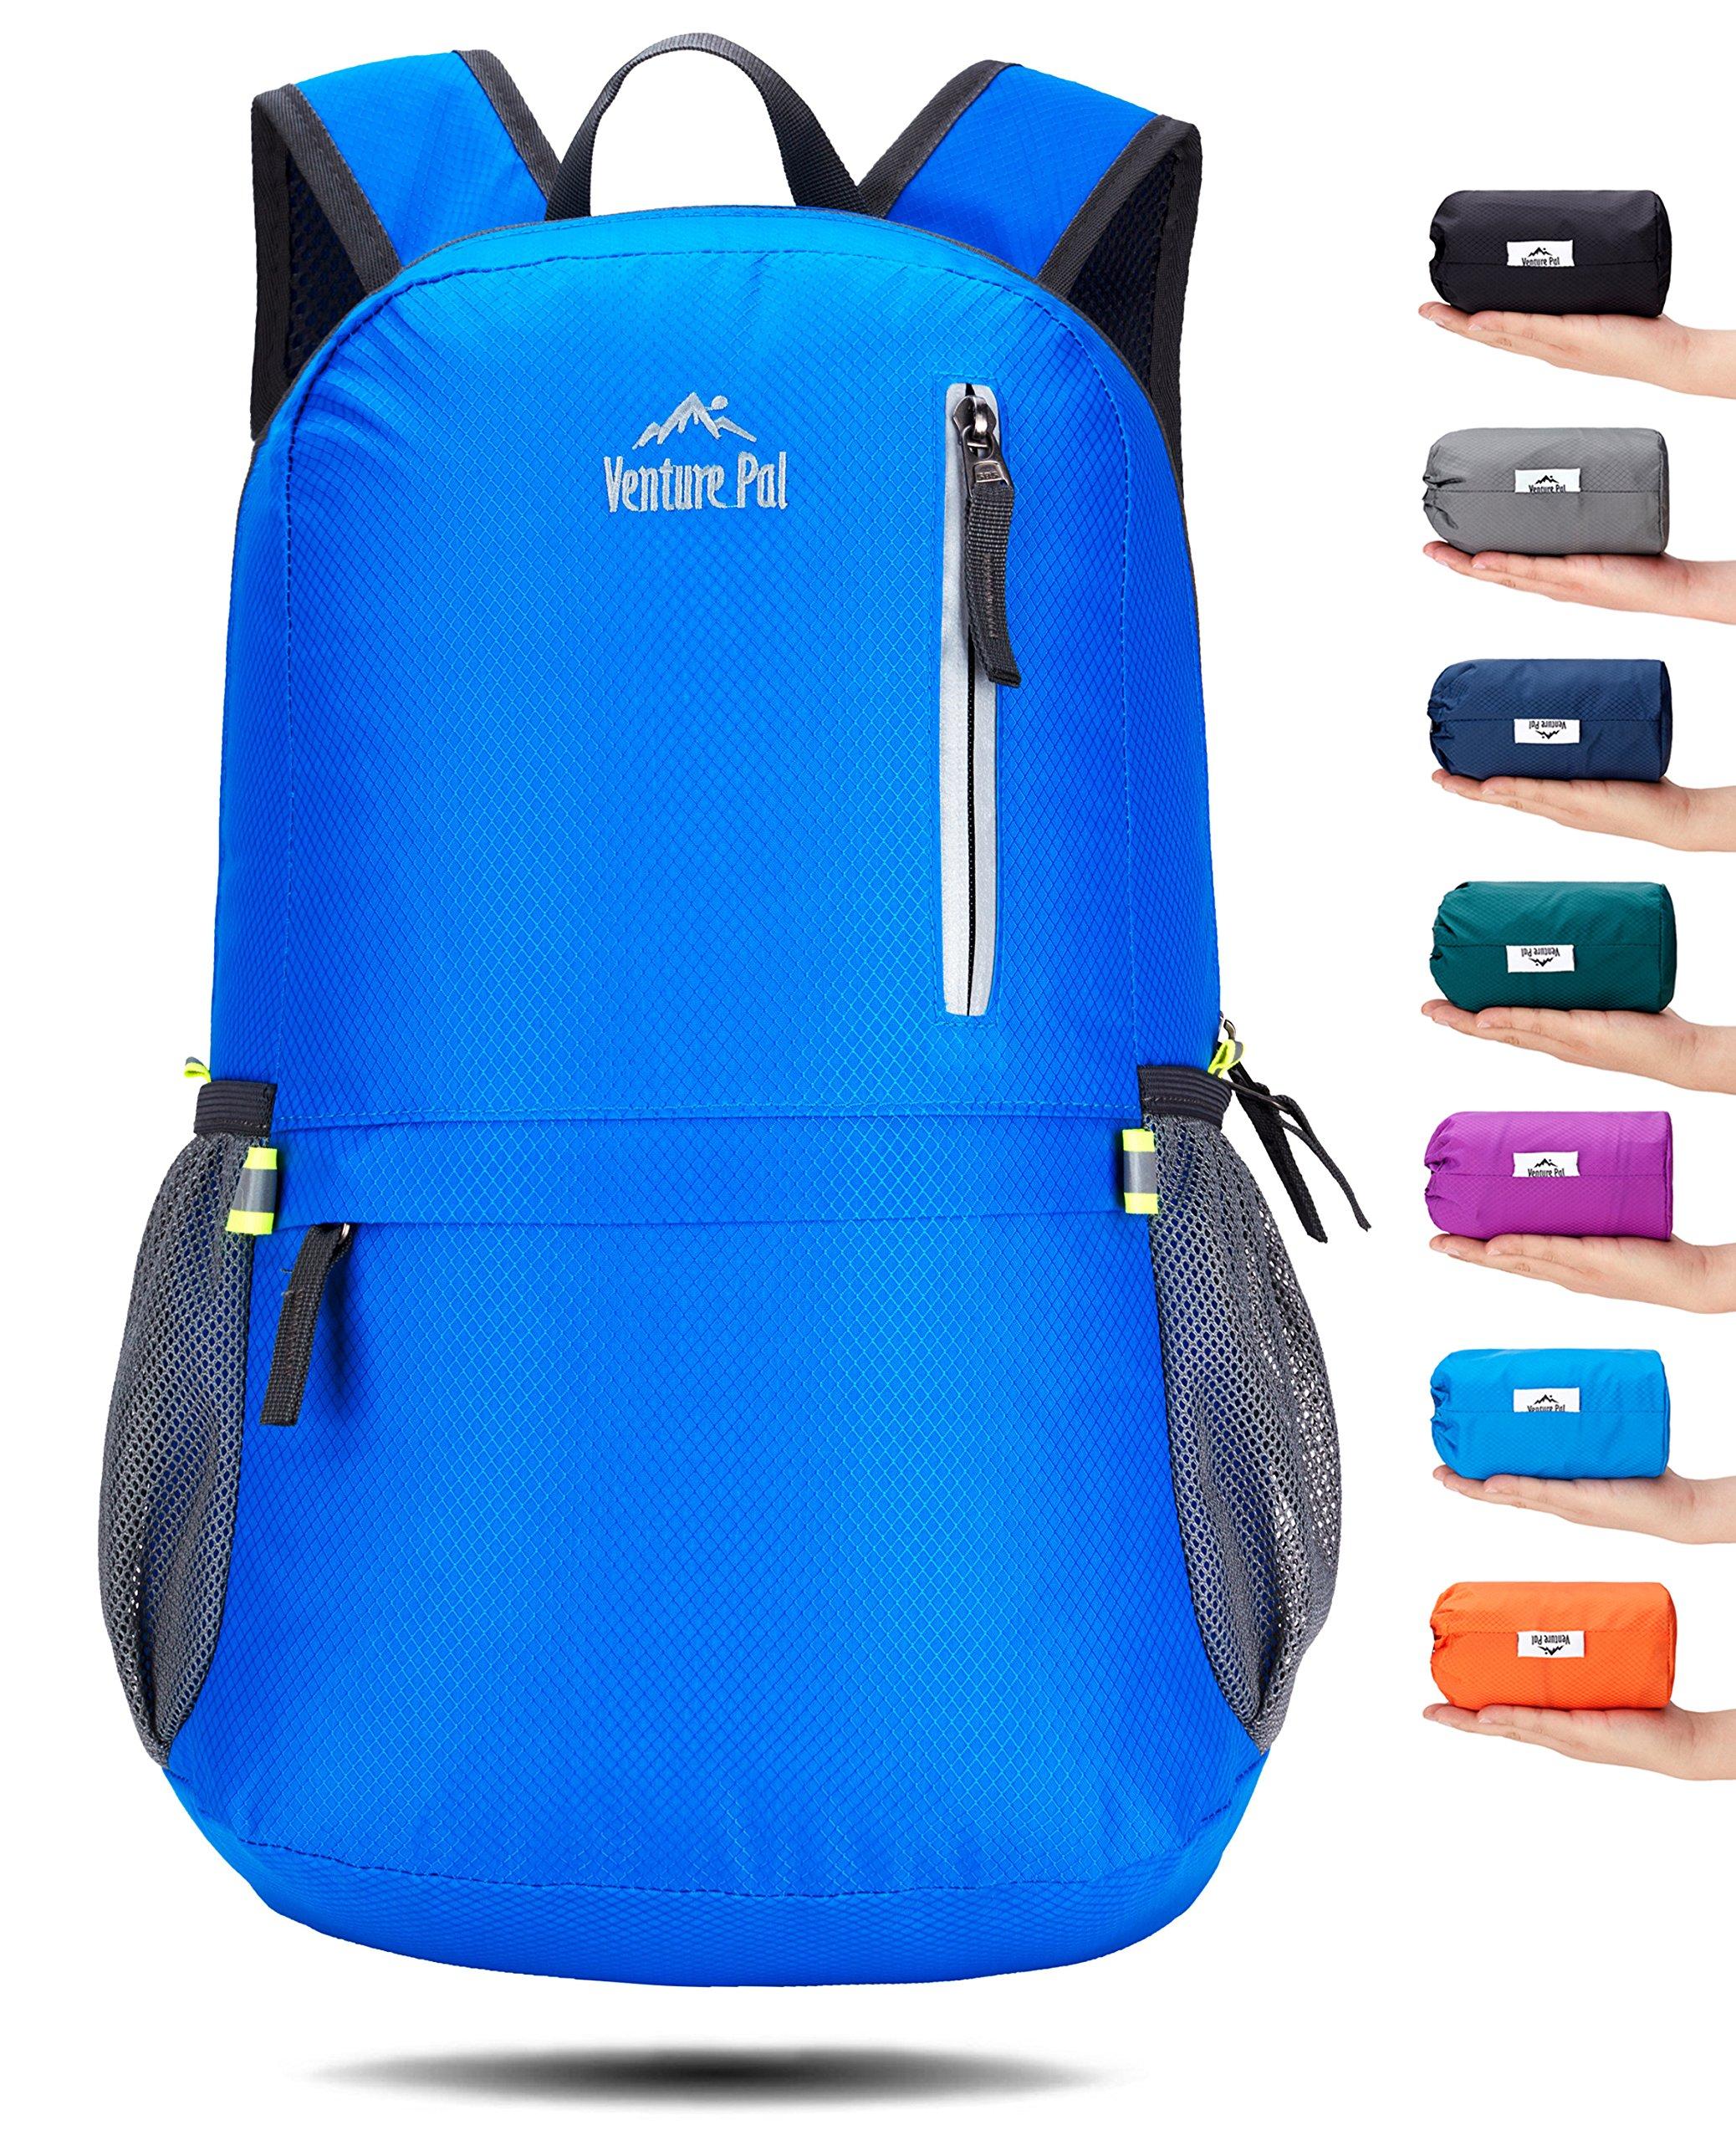 Venture Pal 25L Travel Backpack - Durable Packable Lightweight Small Backpack Women Men (Blue)